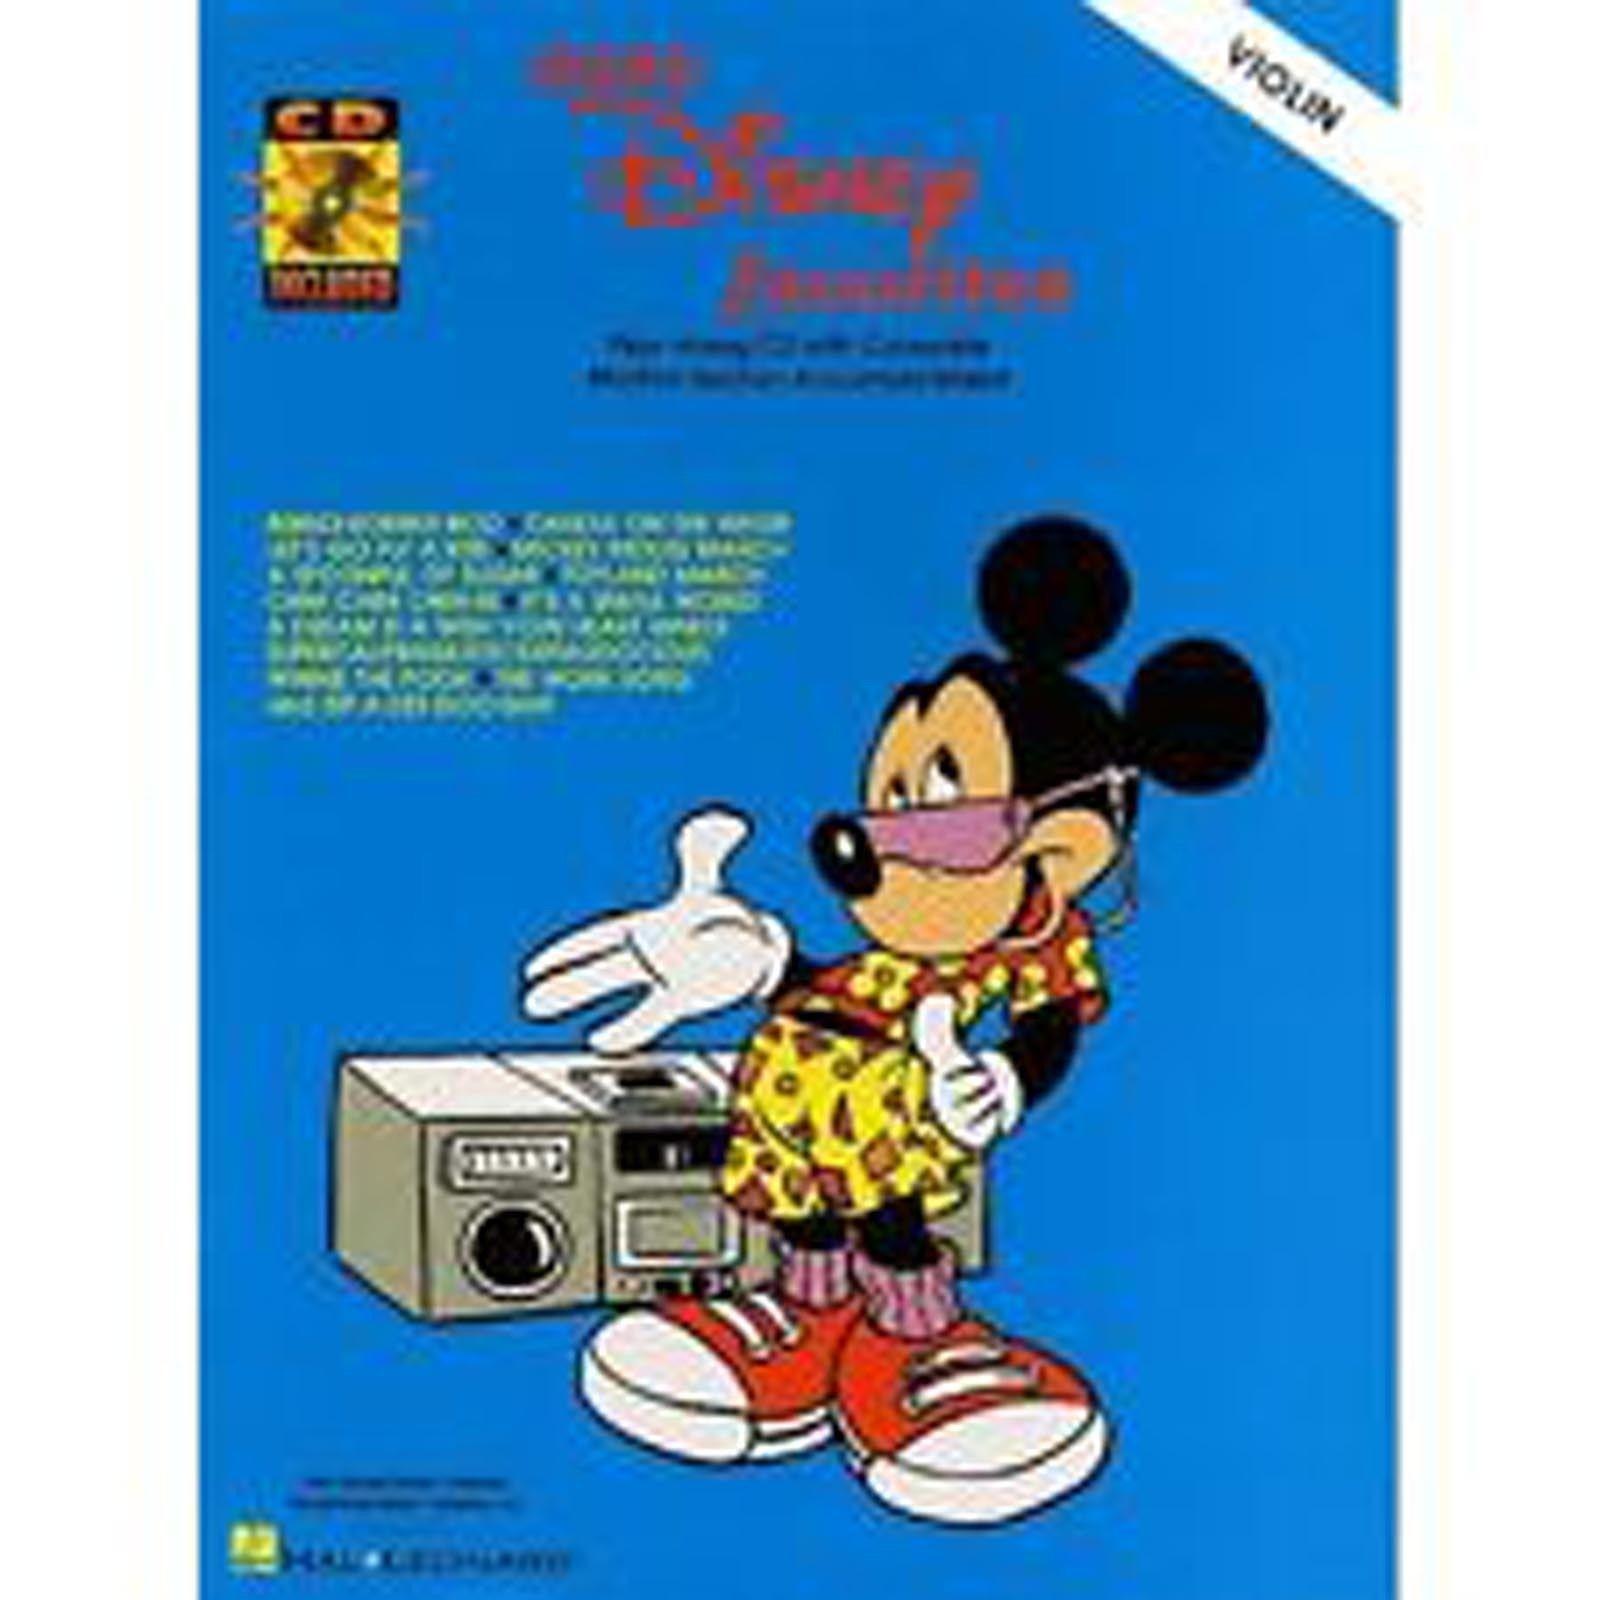 Easy Disney Favorites Favourites Violin Film Tunes Songs Book Play-Along CD B23